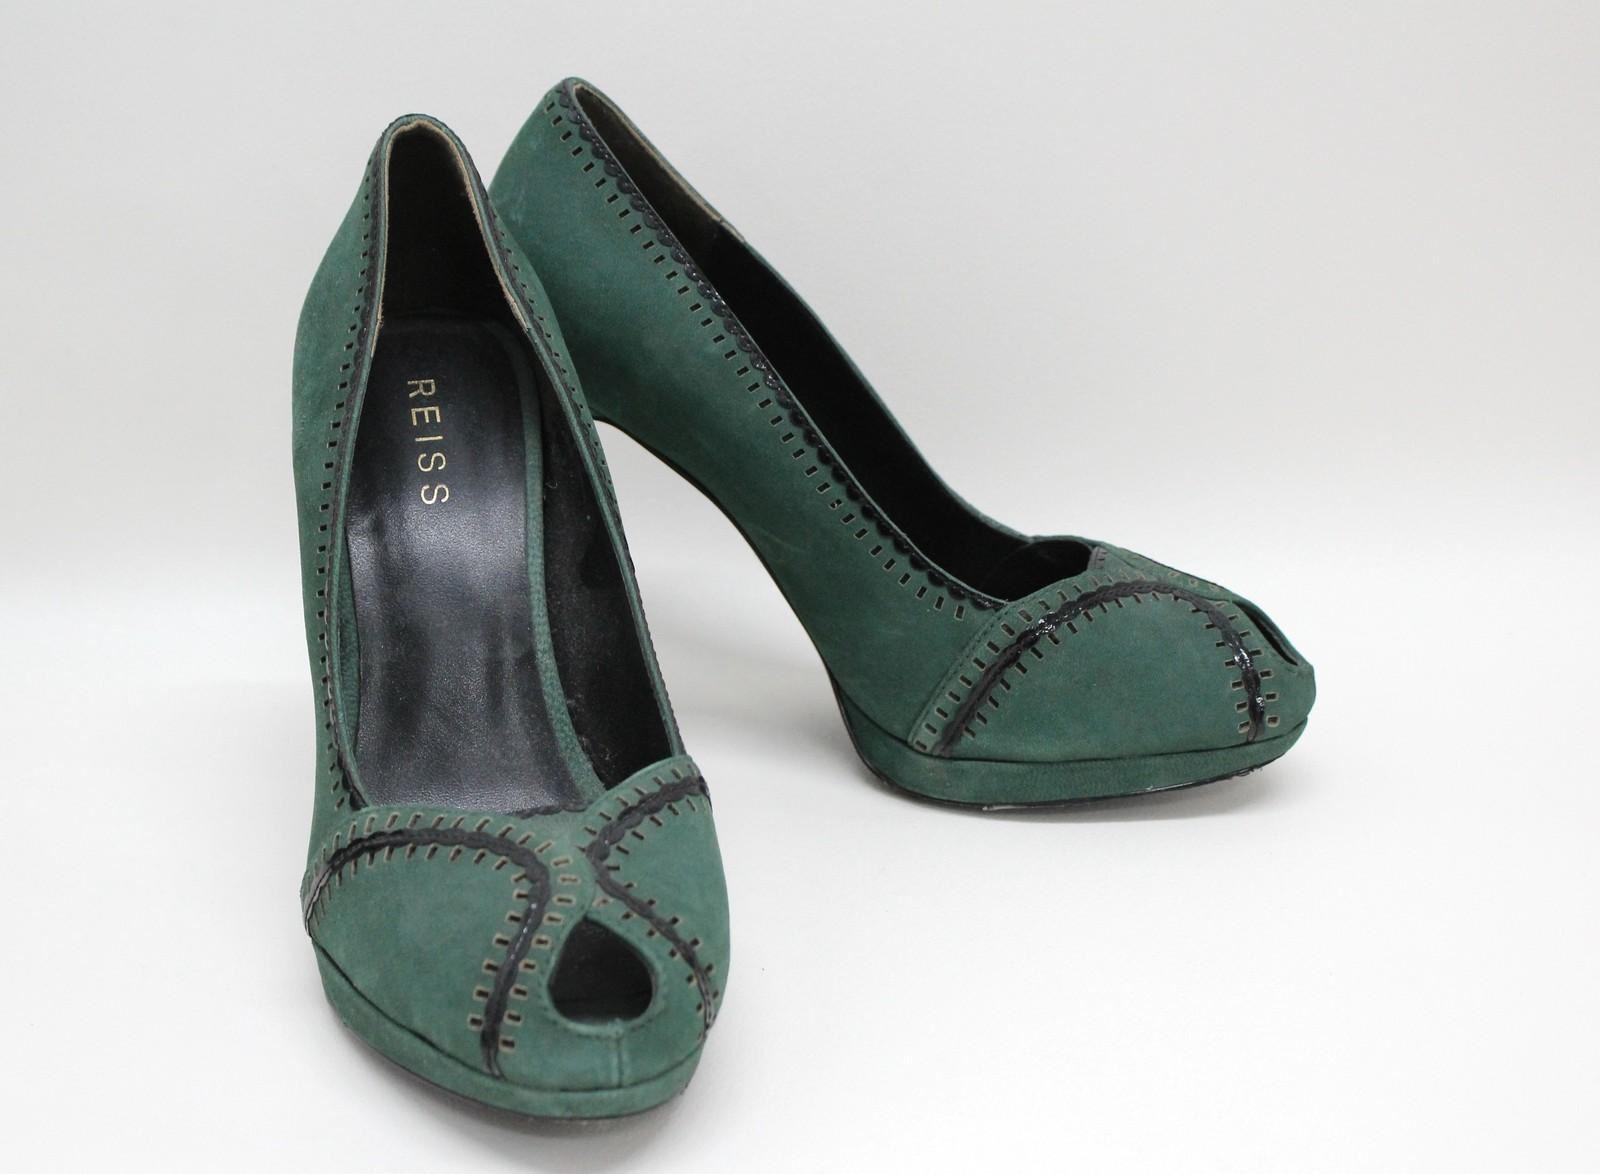 REISS-Ladies-Green-Black-Suede-Cut-Out-Peep-Toe-Court-Shoes-Size-UK8-EU41